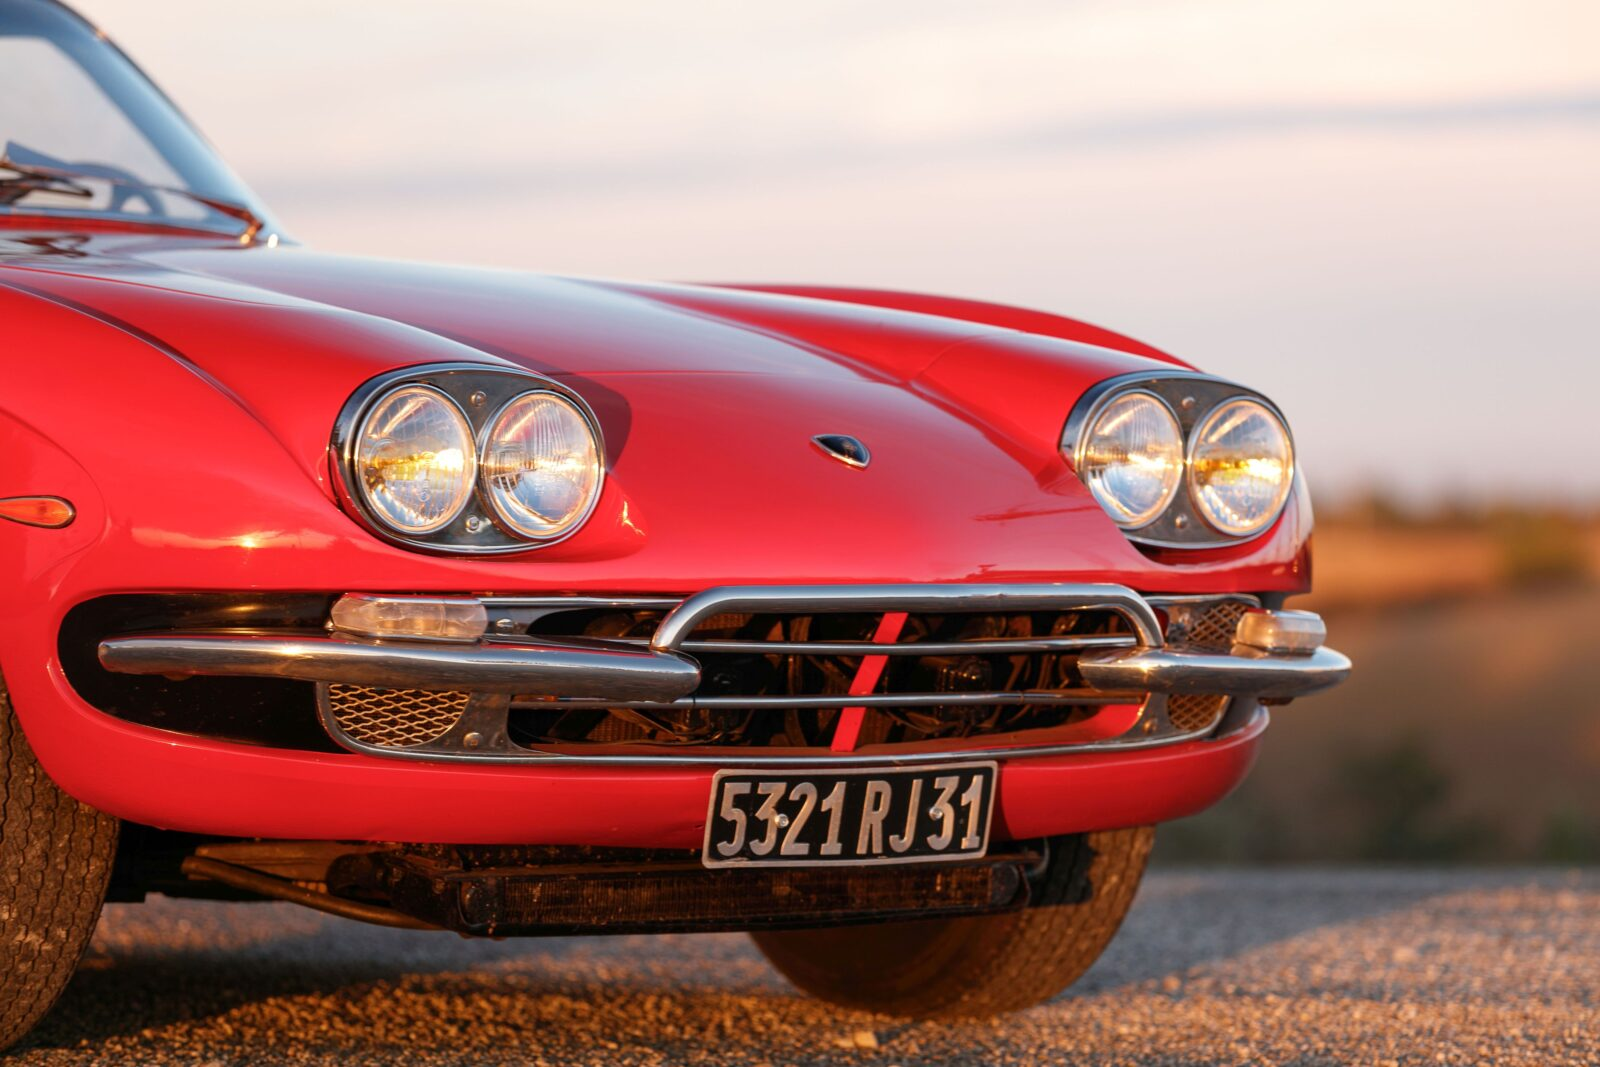 Lamborghini 400 GT 2+2 Headlights